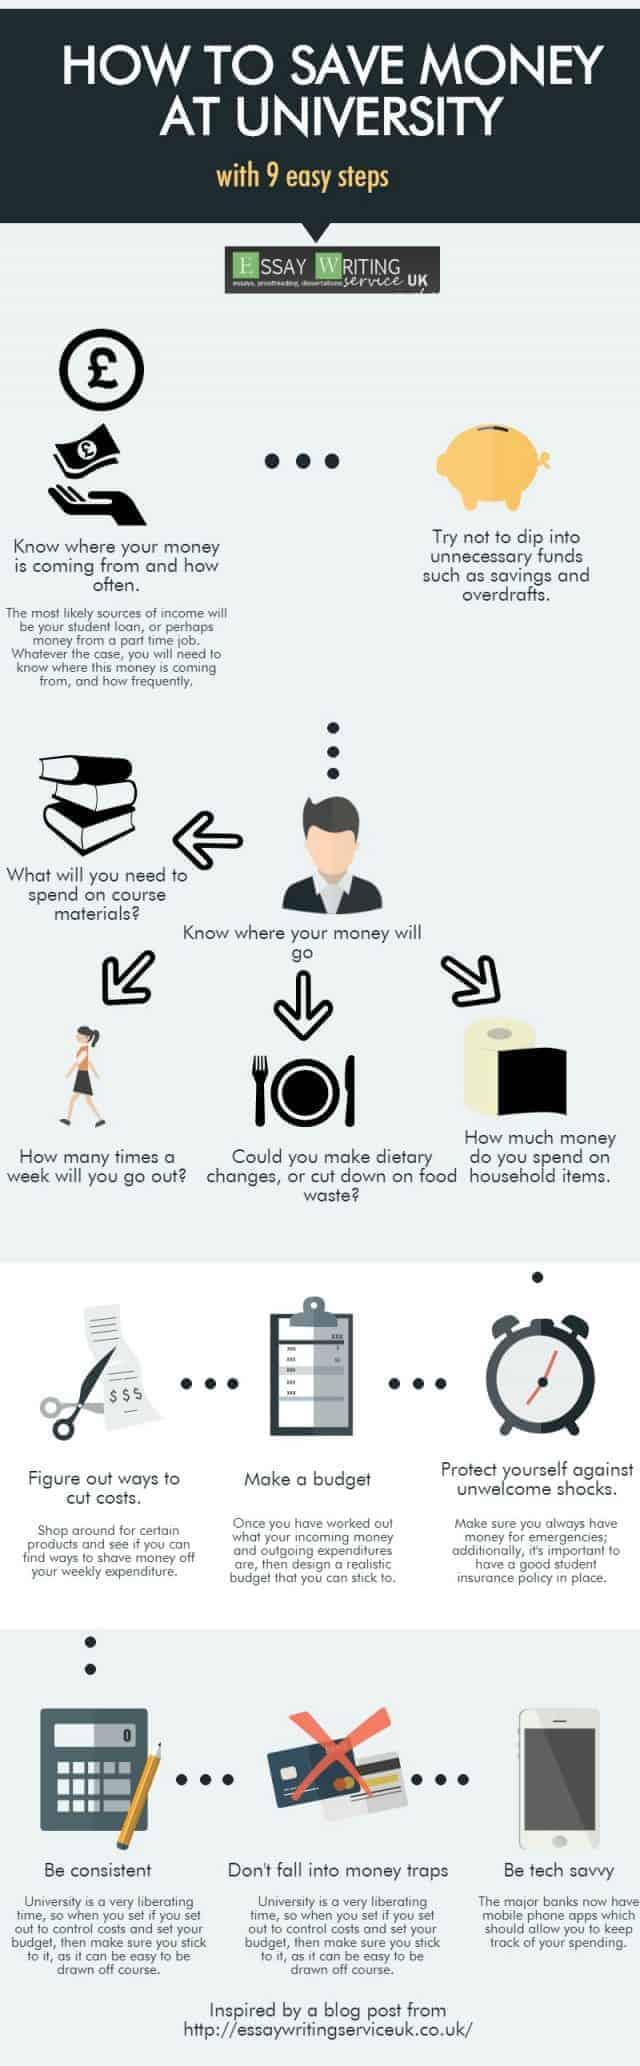 Nine Steps for Saving Money at University